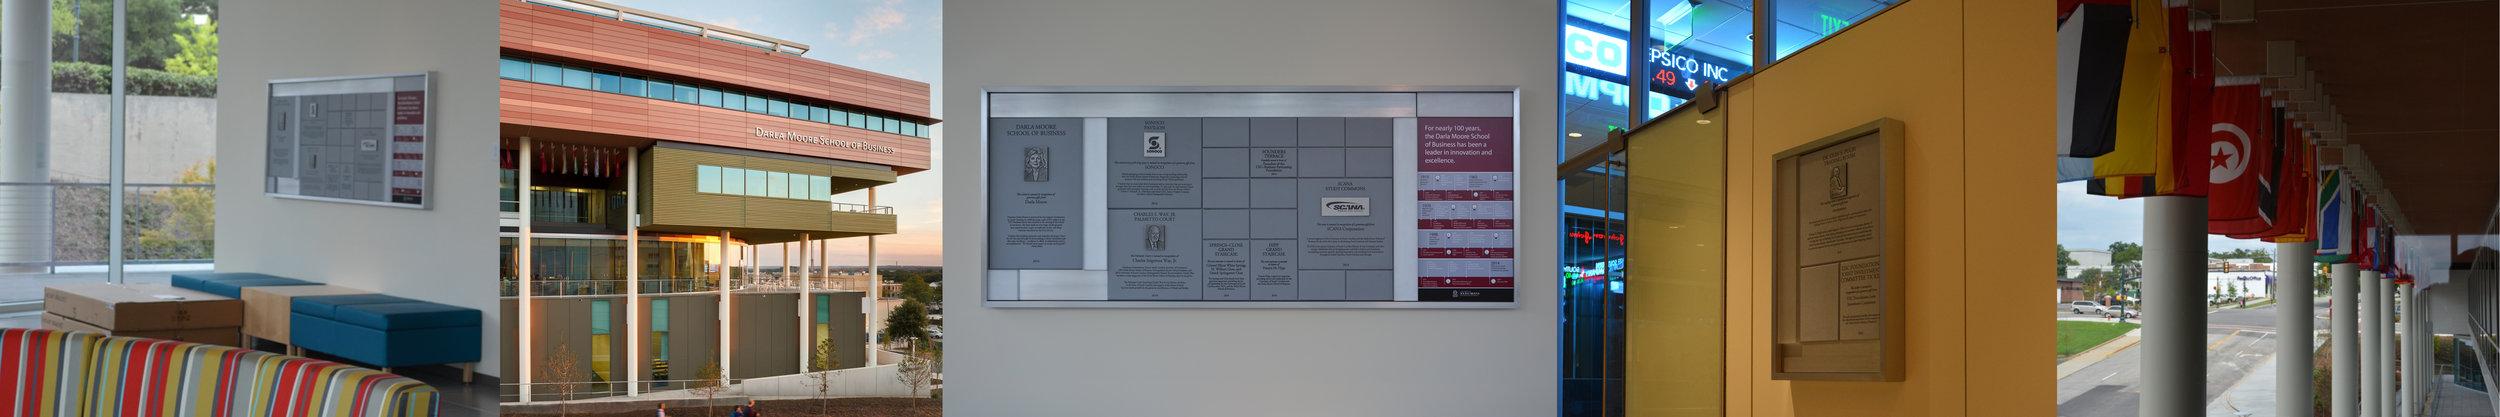 Donor-recognition-university-of-south-carolina.jpg